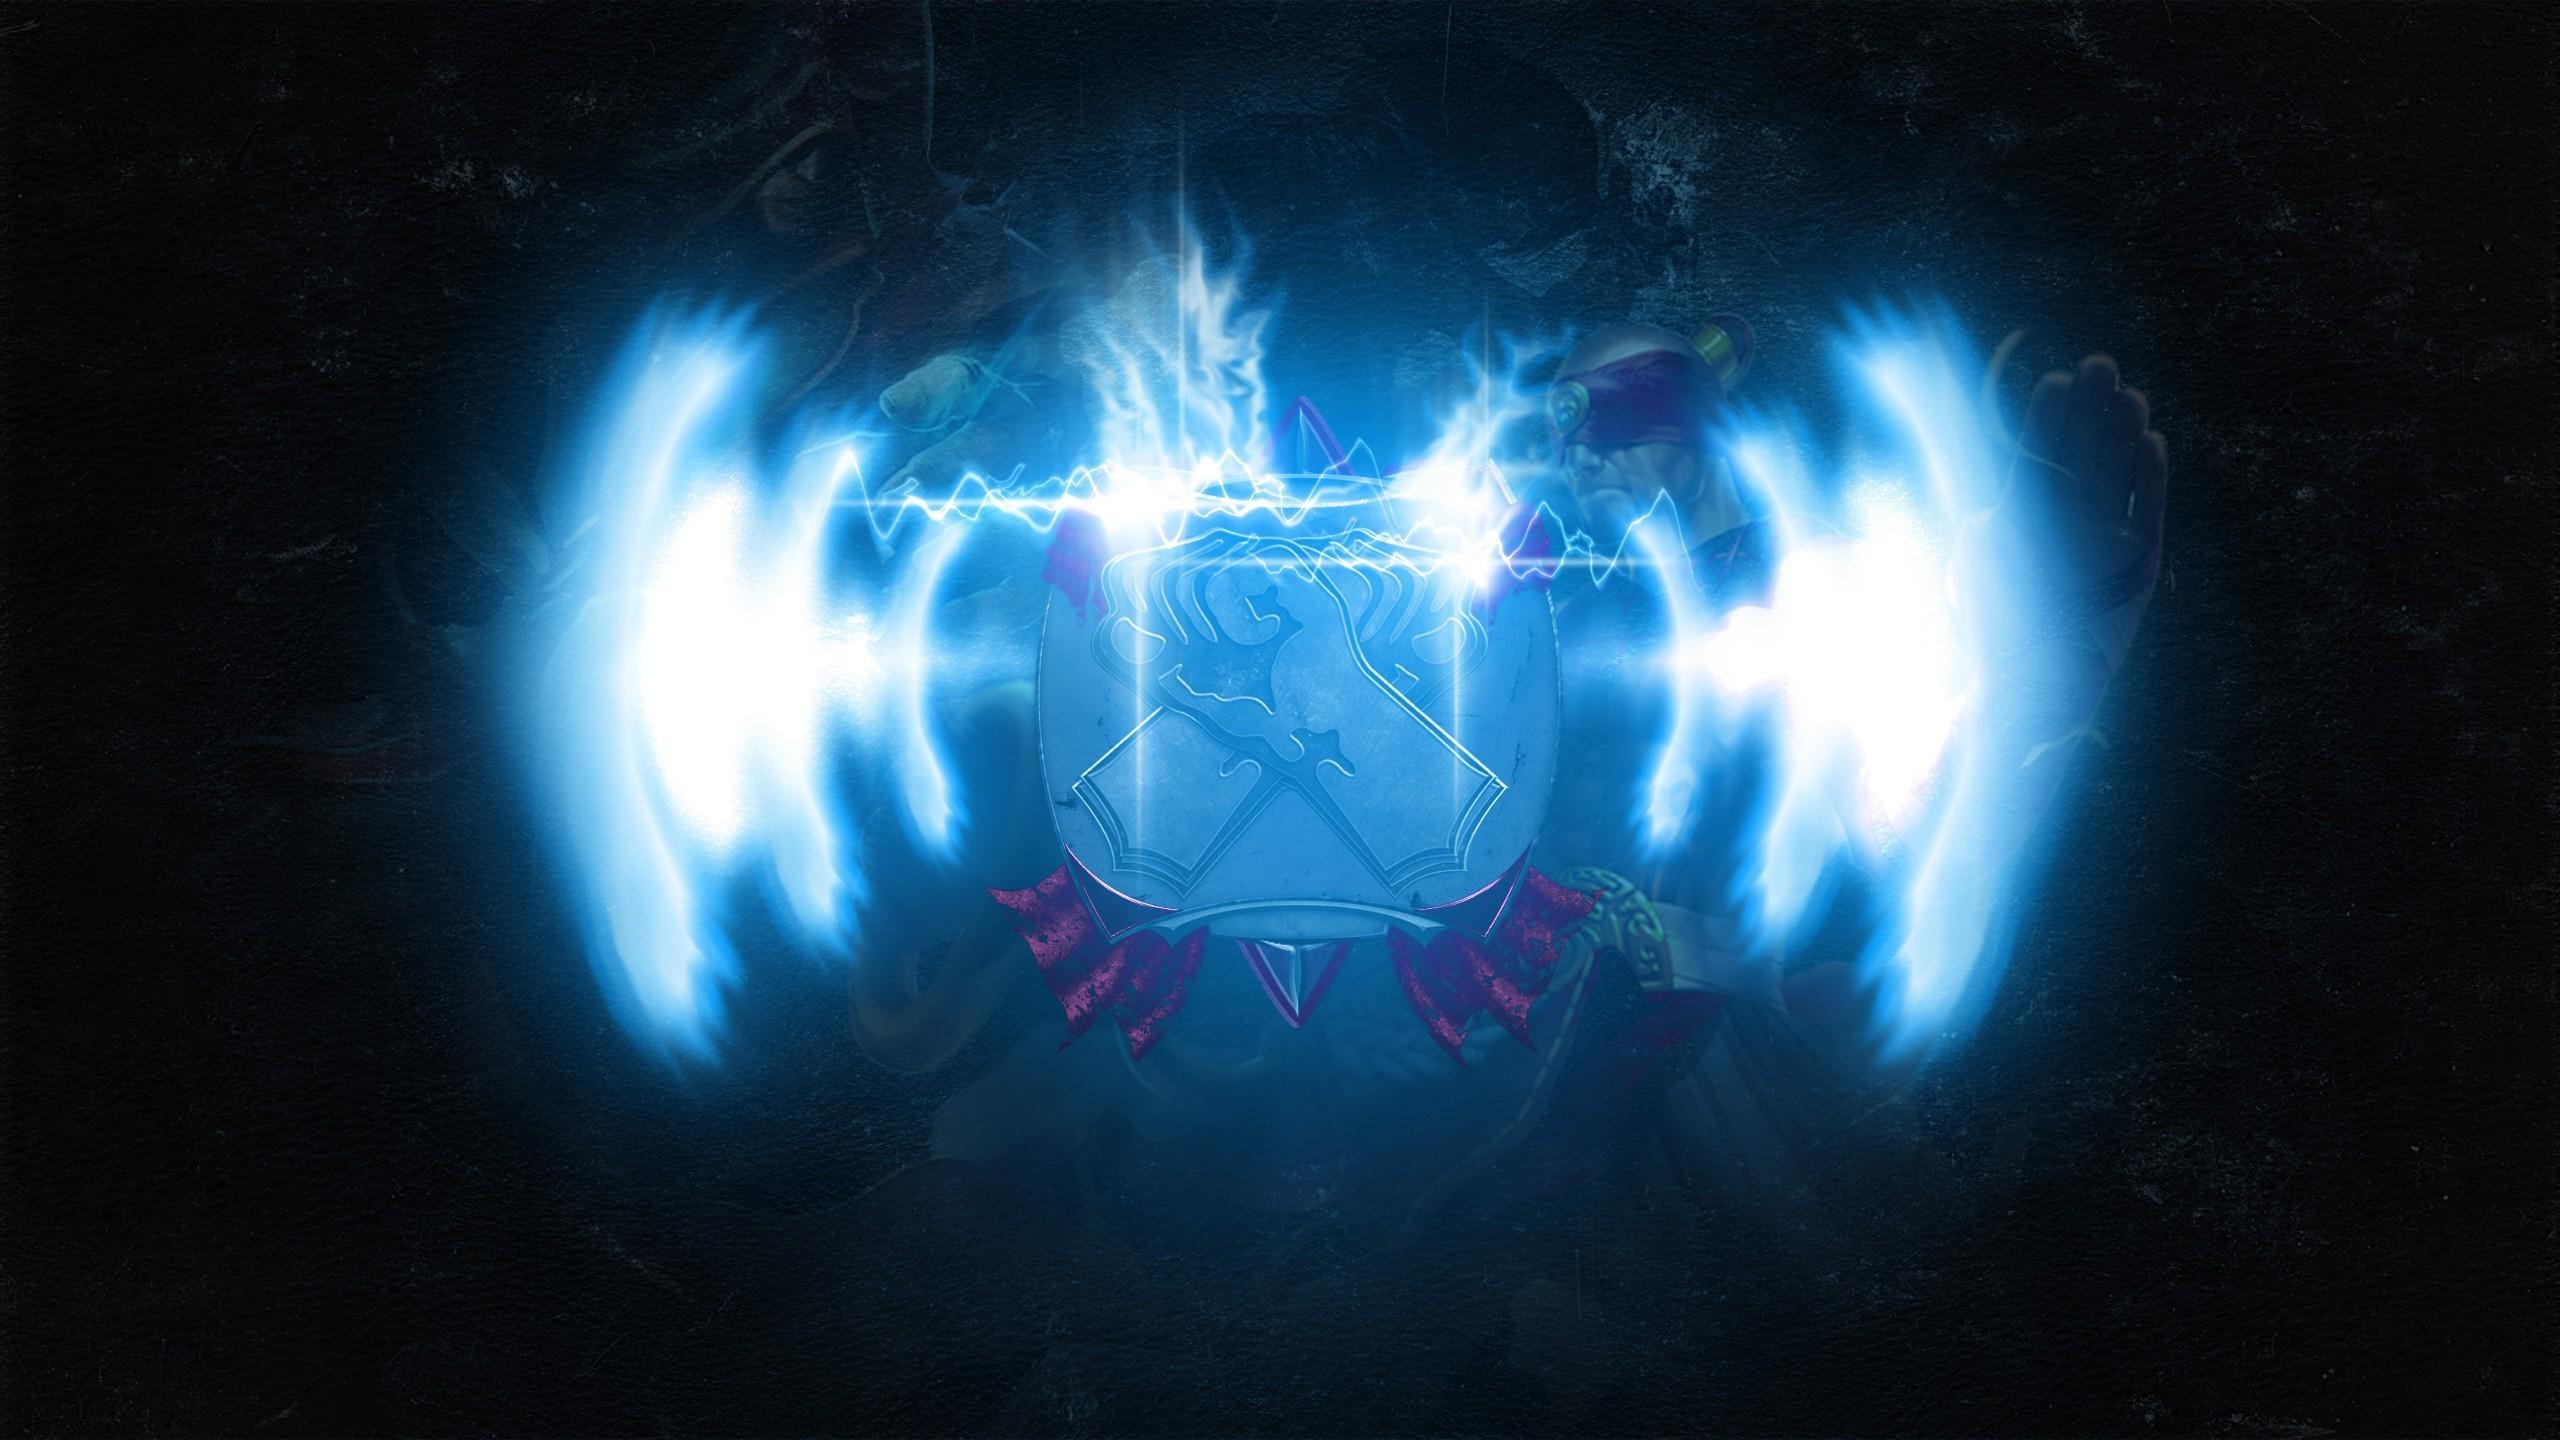 … riot games league of legends lee sin wallpapers hd desktop and …